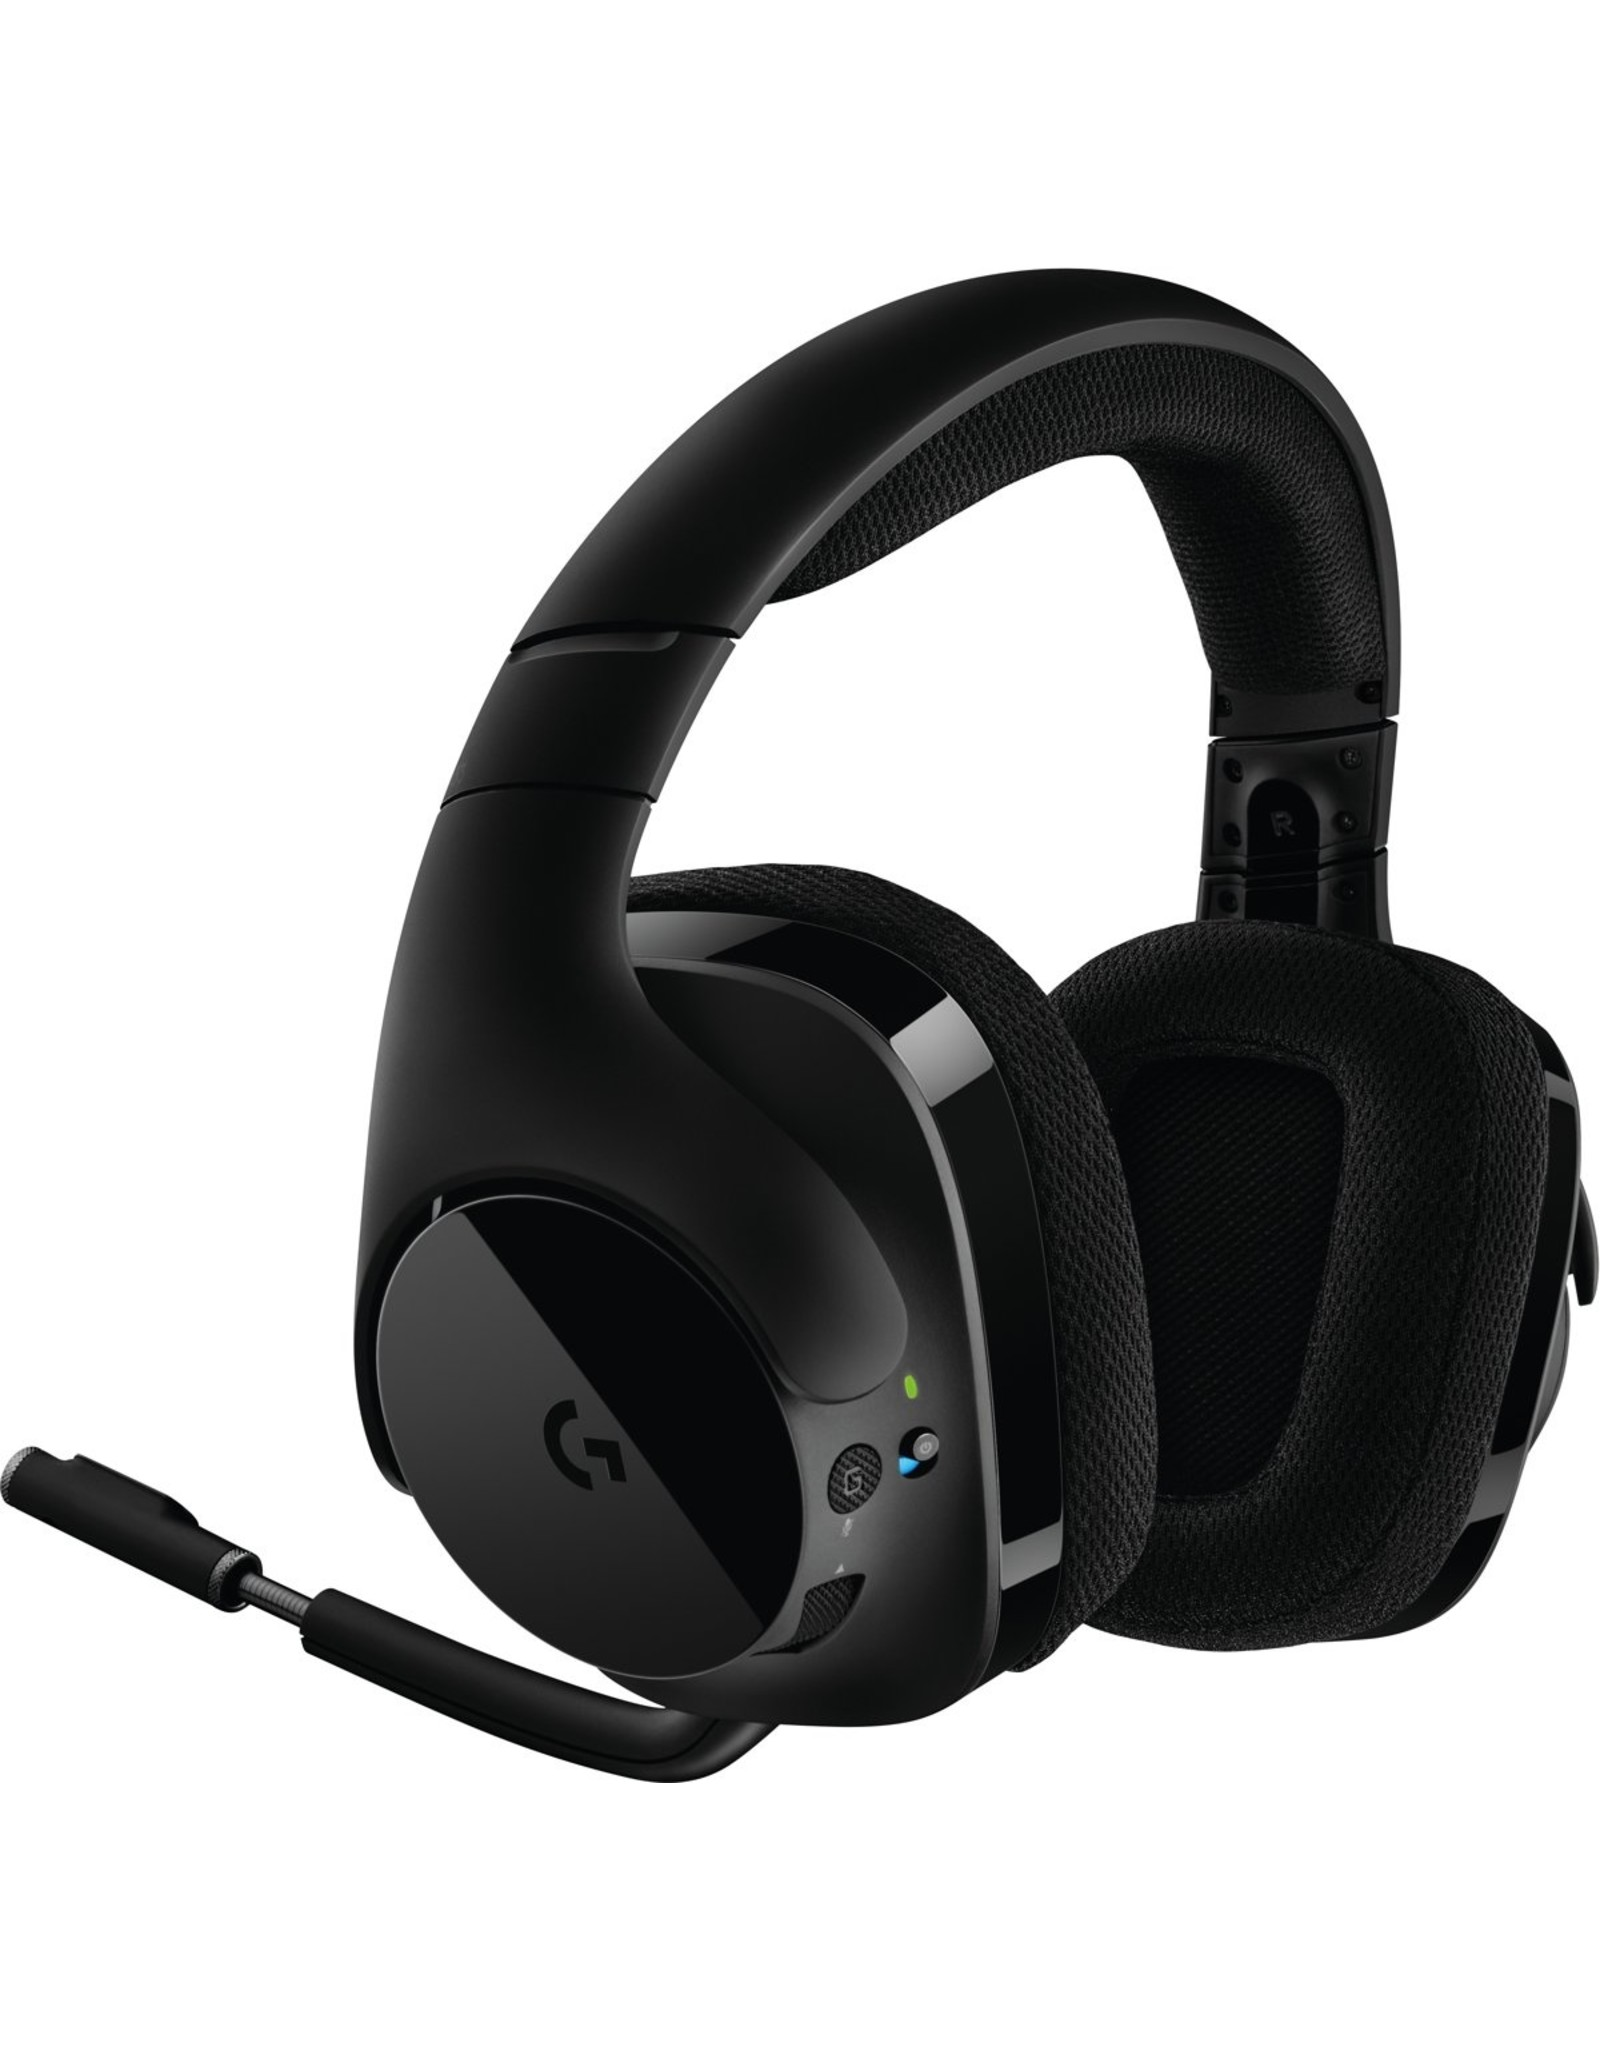 Logitech Logitech G533 - Draadloze DTS 7.1 Surround Gaming Headset - PC